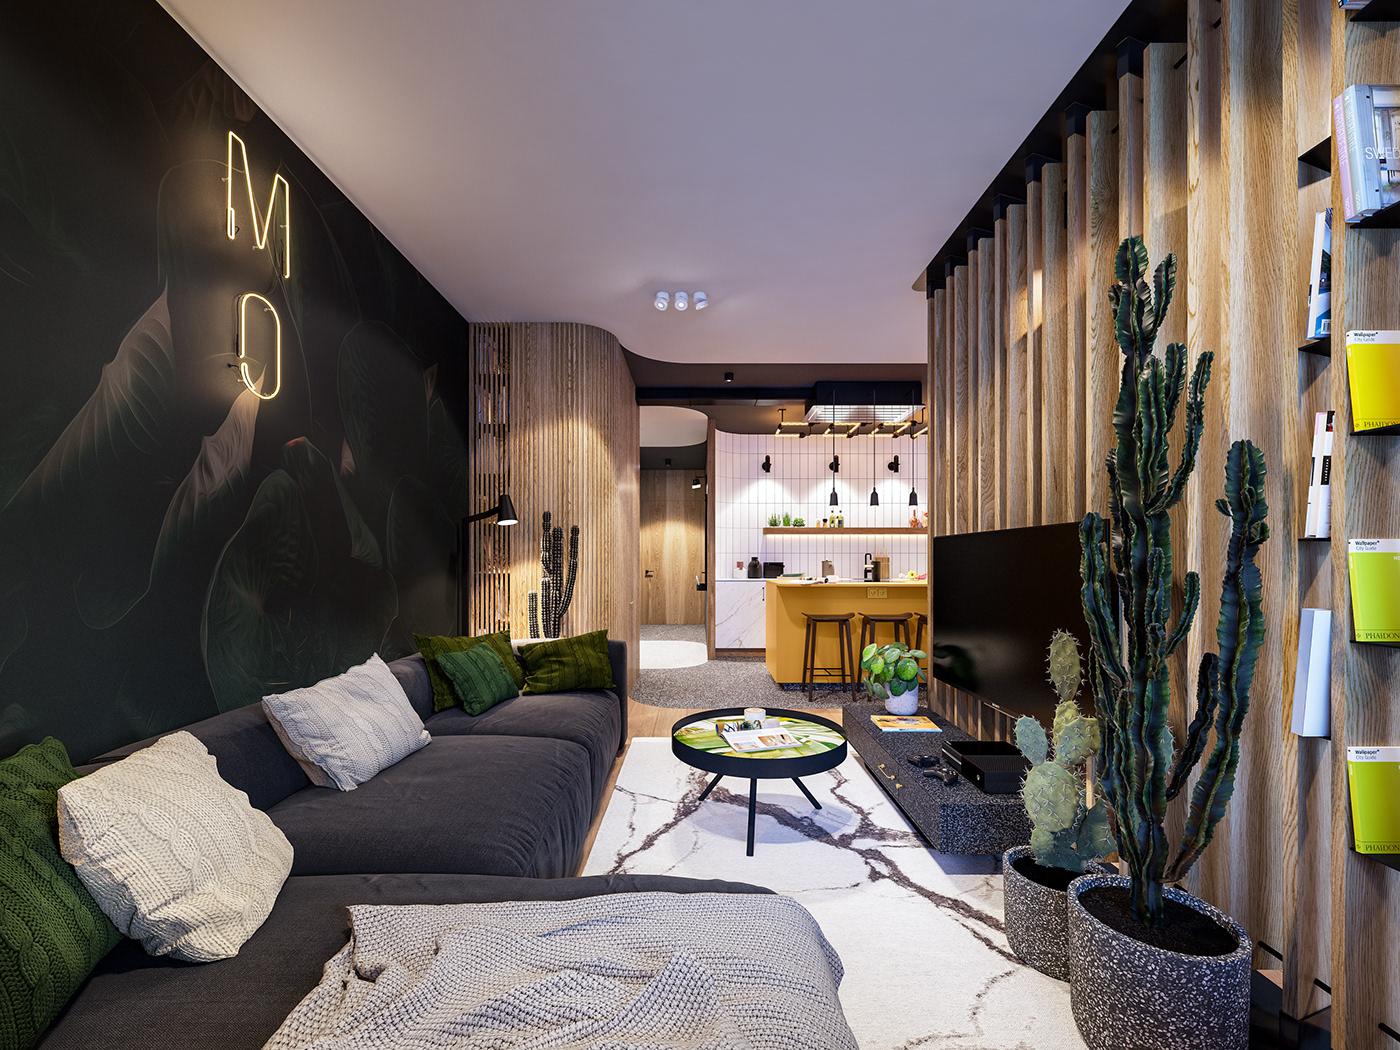 Interior design modern wood green cosy homey relax